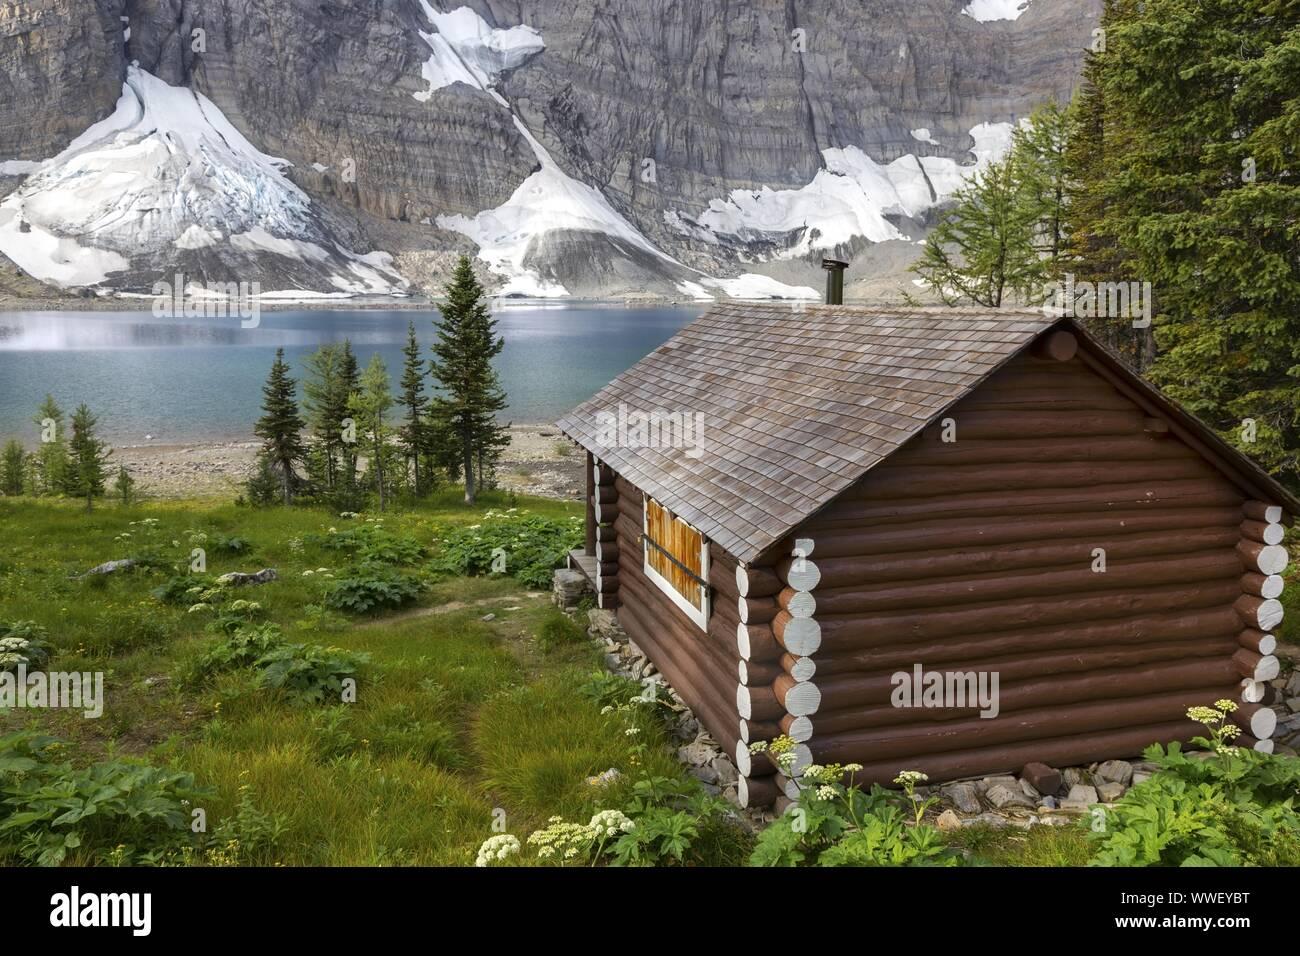 Heritage Landmark Log Cabin on a Green Alpine Meadow near Floe Lake on a great Summertime Hiking Trail in Kootenay National Park Canadian Rockies Stock Photo